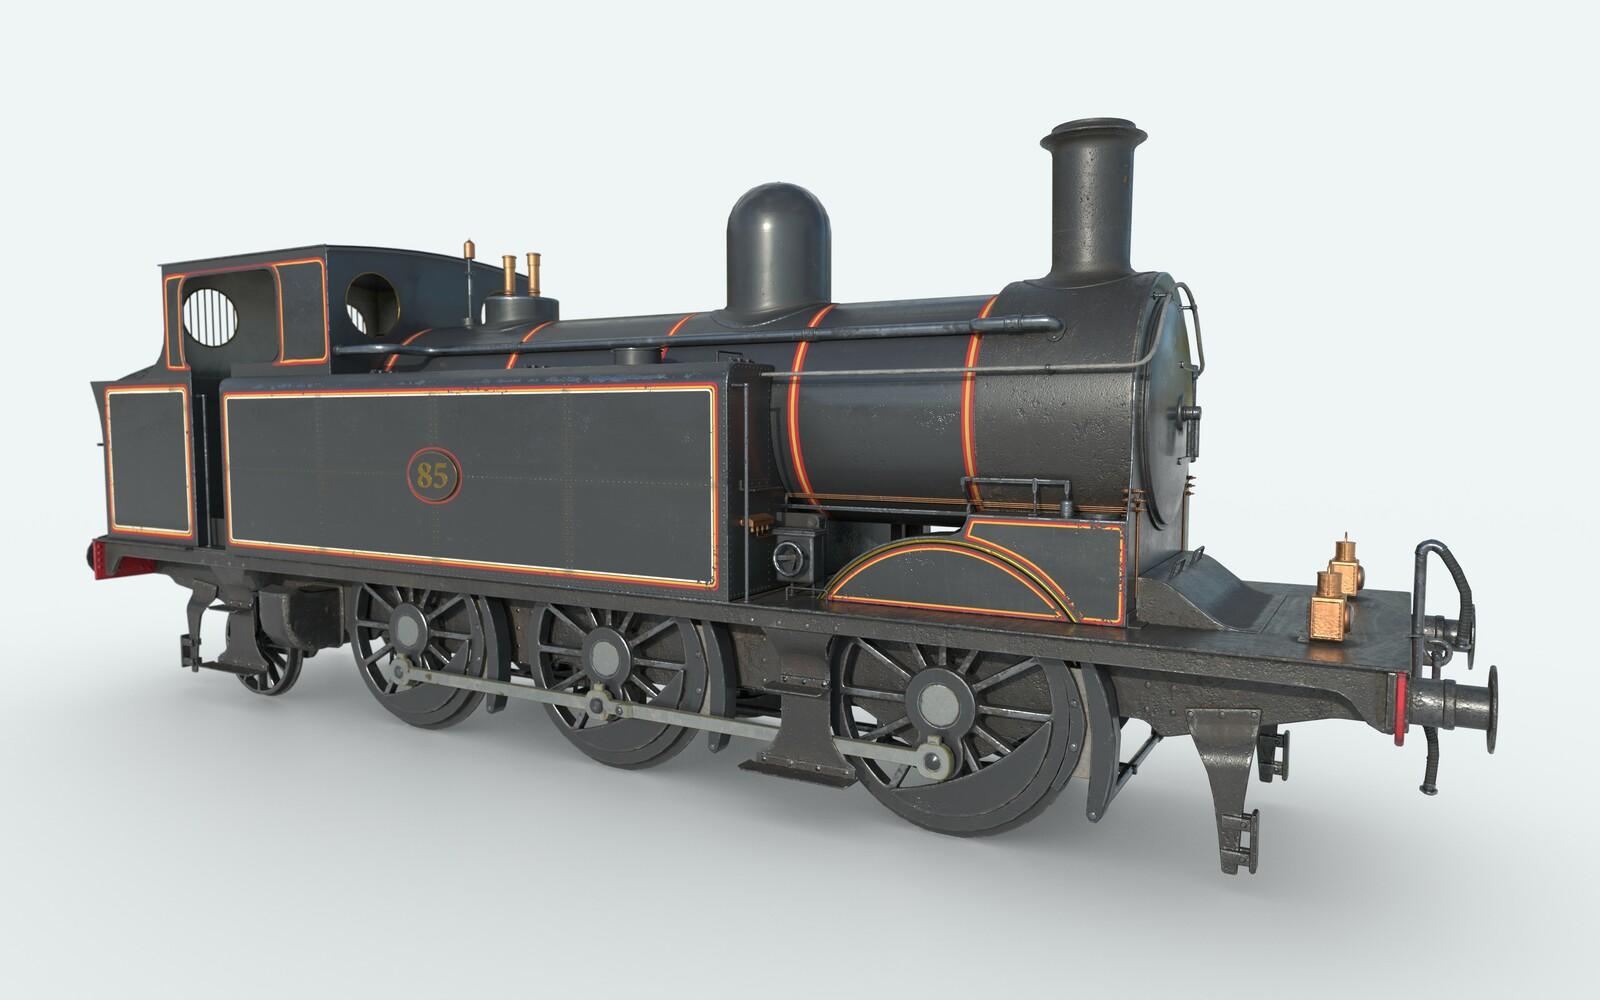 Taff Vale (historical train)